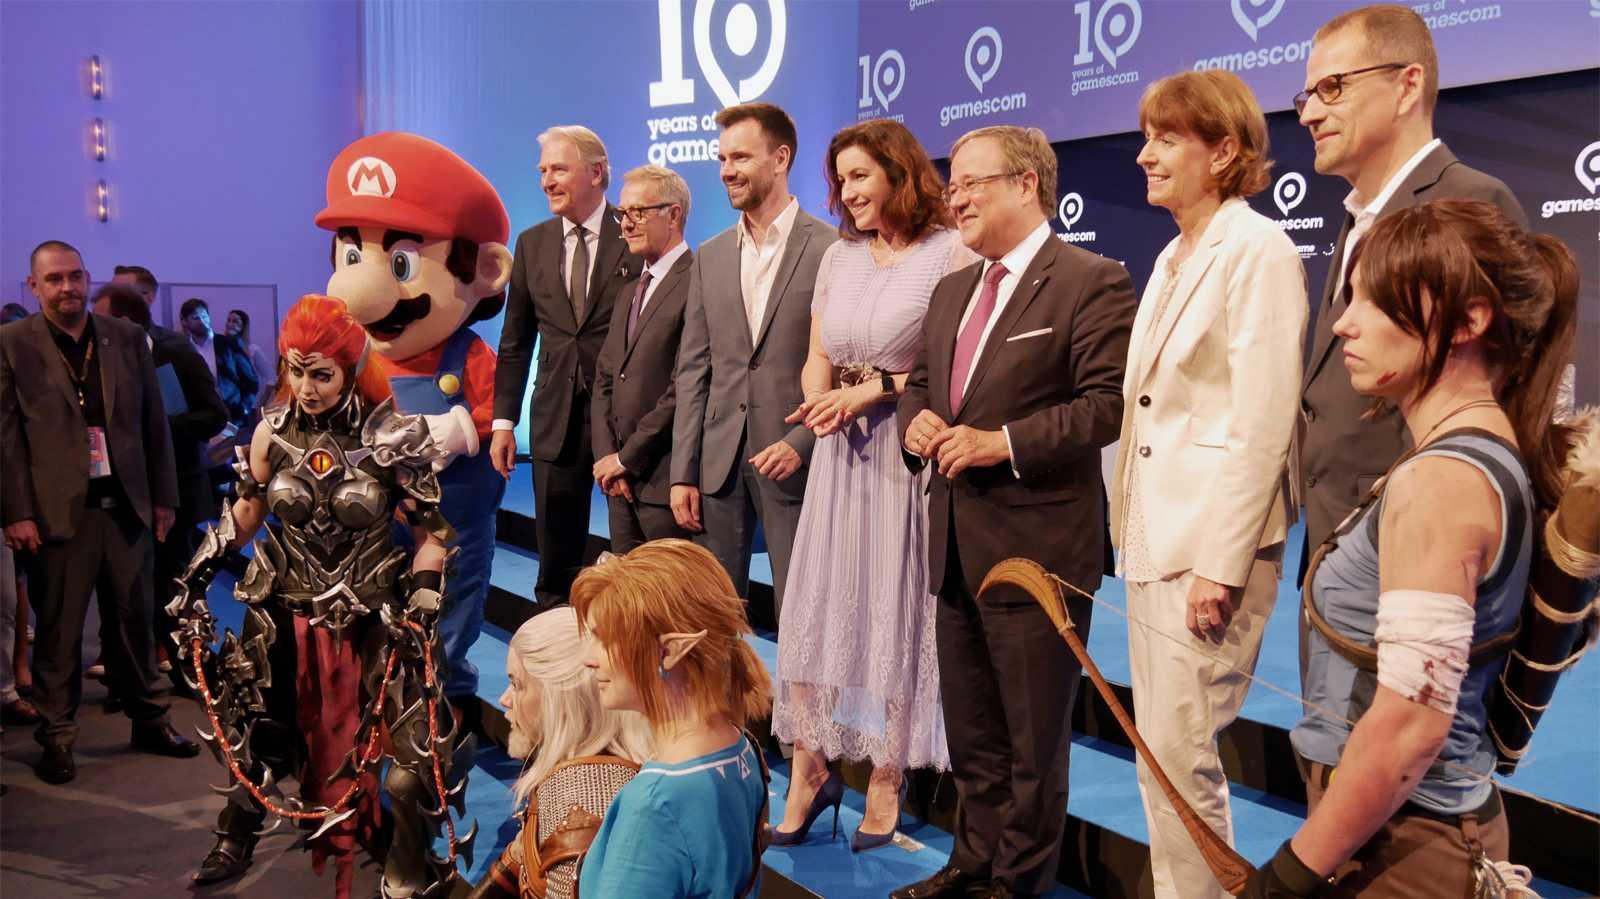 Gamescom-Eröffnung: Kulturgüter und Weltpremieren